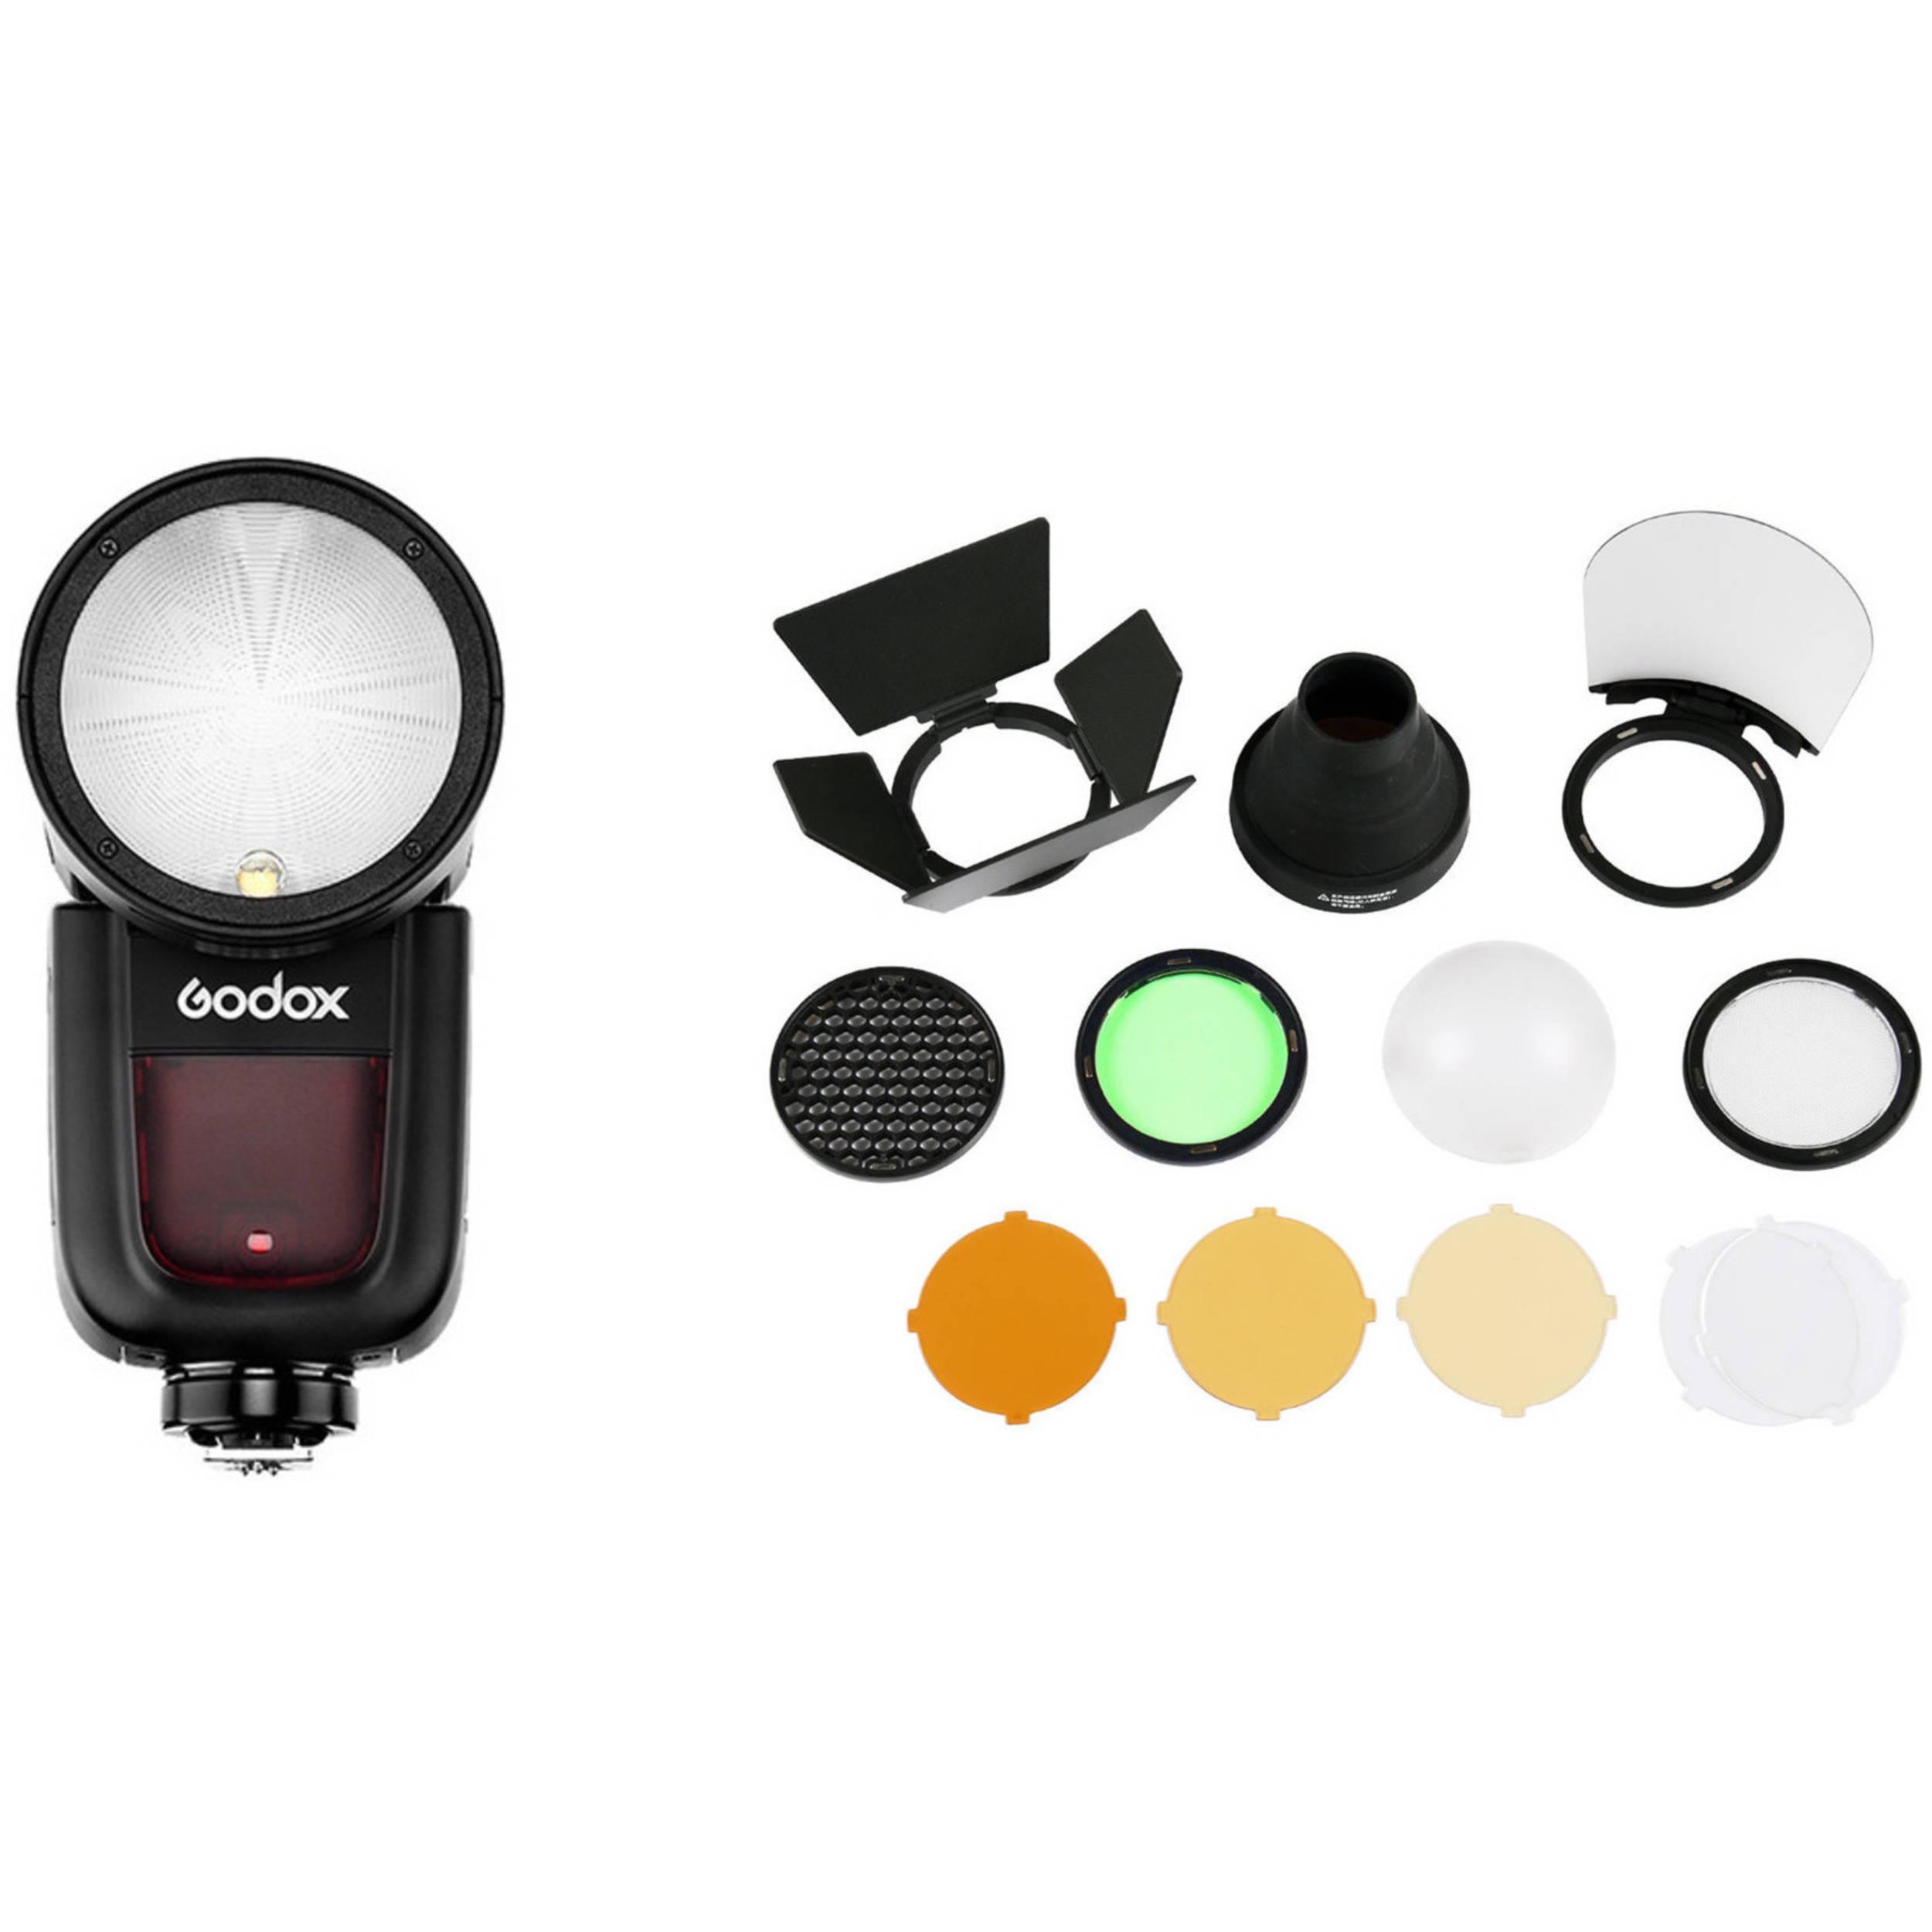 Godox V1-N Flash Interchangeable 2600mAh Lithimu Battery with AK-R1 for Nikon 480 Full Power Shots 1.5 sec Recycle Time,1//8000 HSS